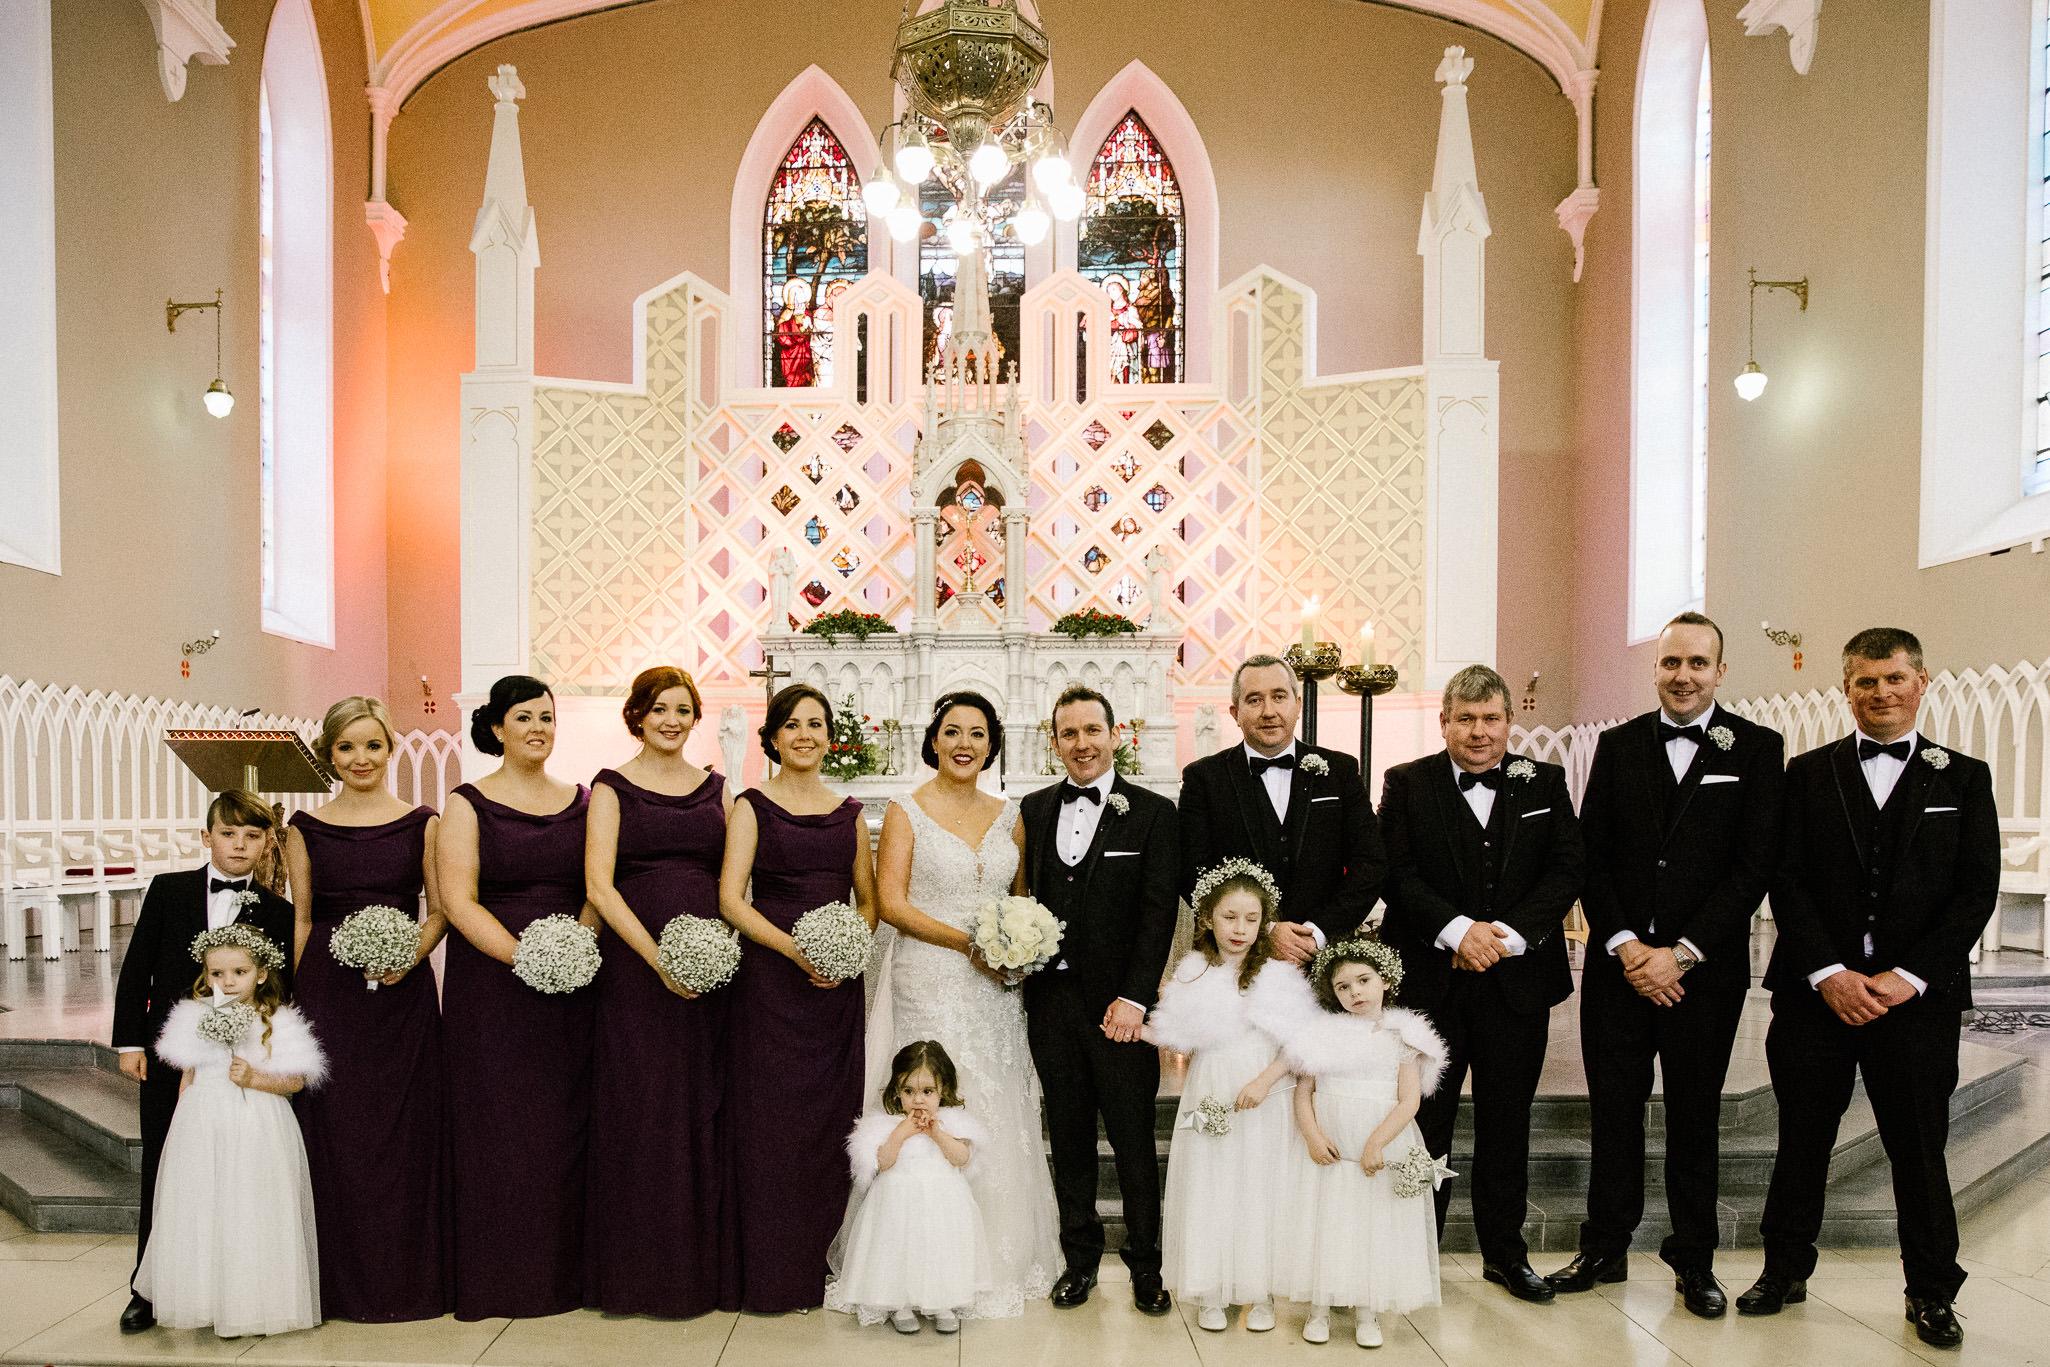 clairebyrnephotography-wedding-sparklers-christmas-orlagh-daithi-5.jpg